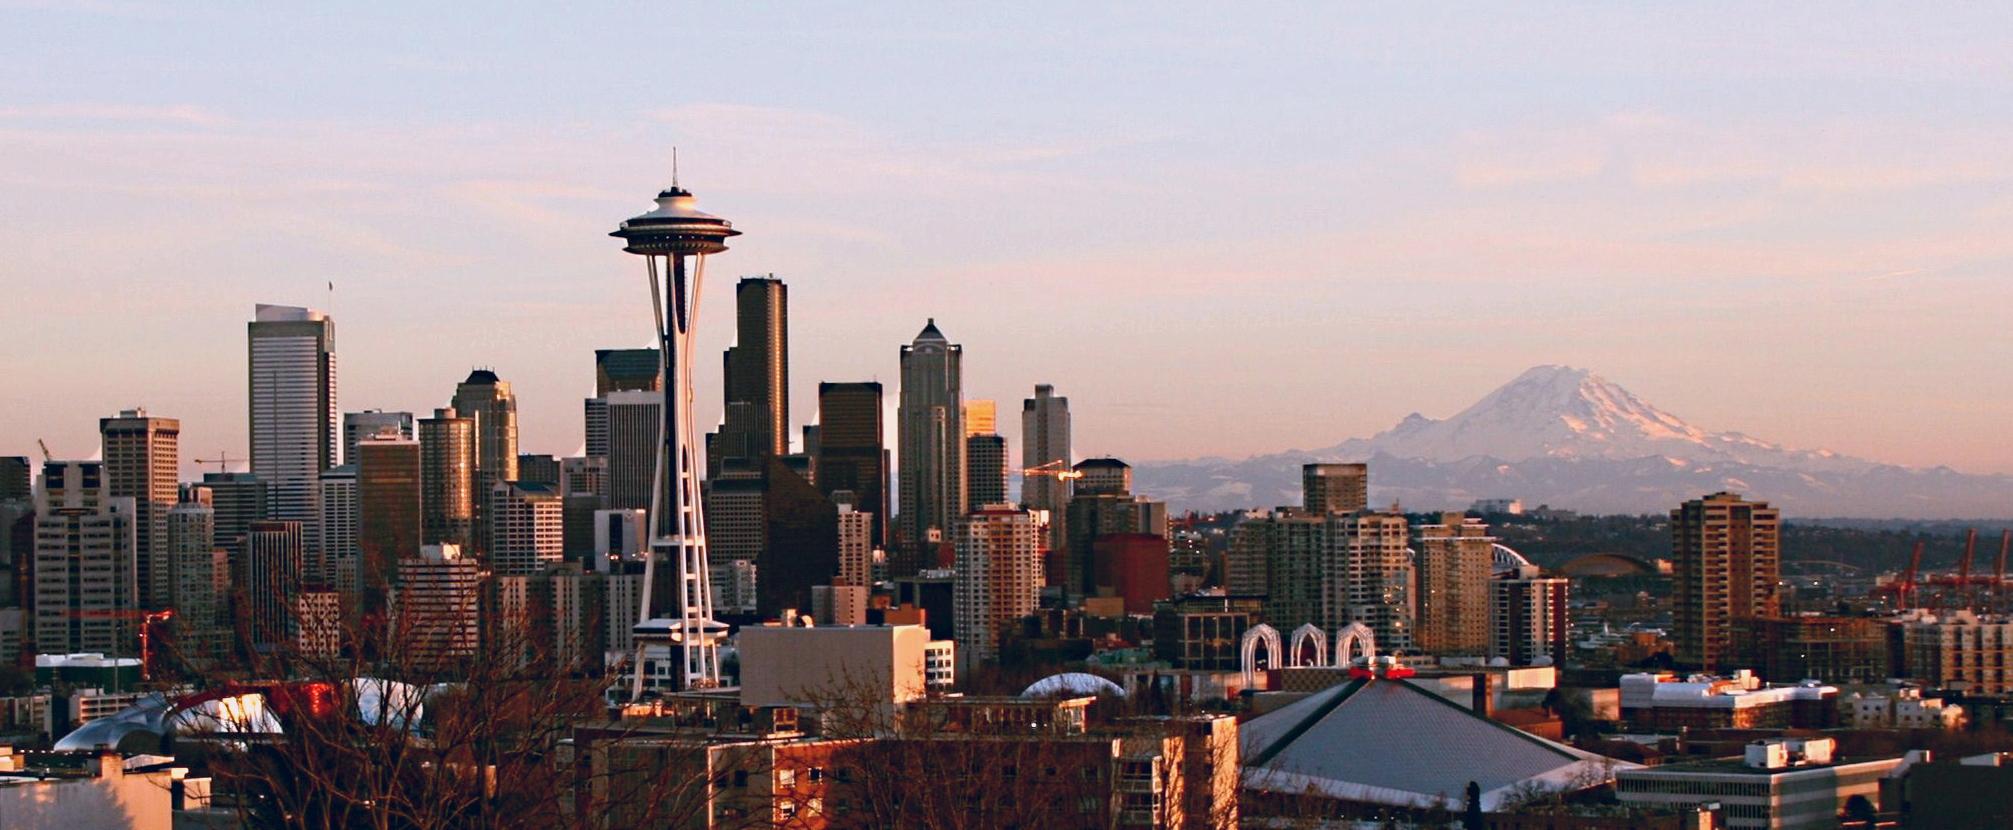 Seattle - 300 N.E. 97th Street • Seattle, Washington 98115p: 206.522.5500 | e: seattle@northwestrealtors.com